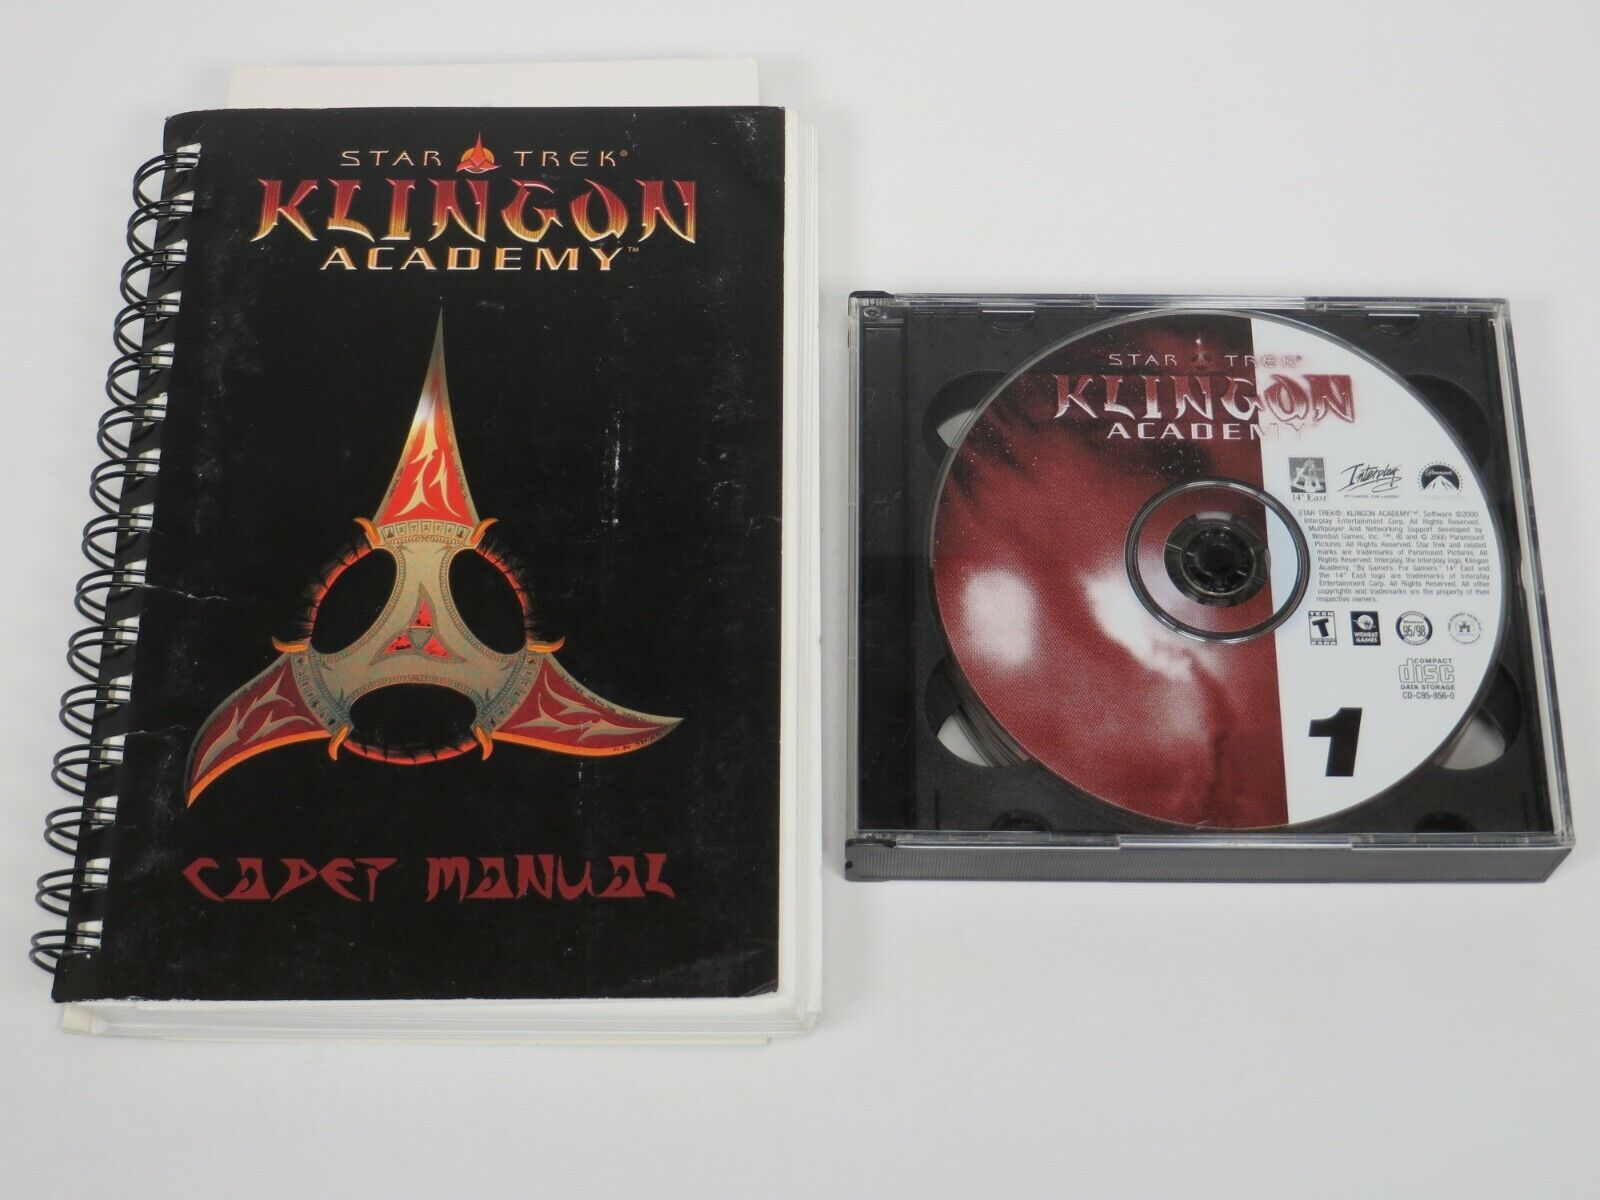 Computer Games - Star Trek Klingon Academy (PC, 2000) PC Vintage Computer Game Interplay